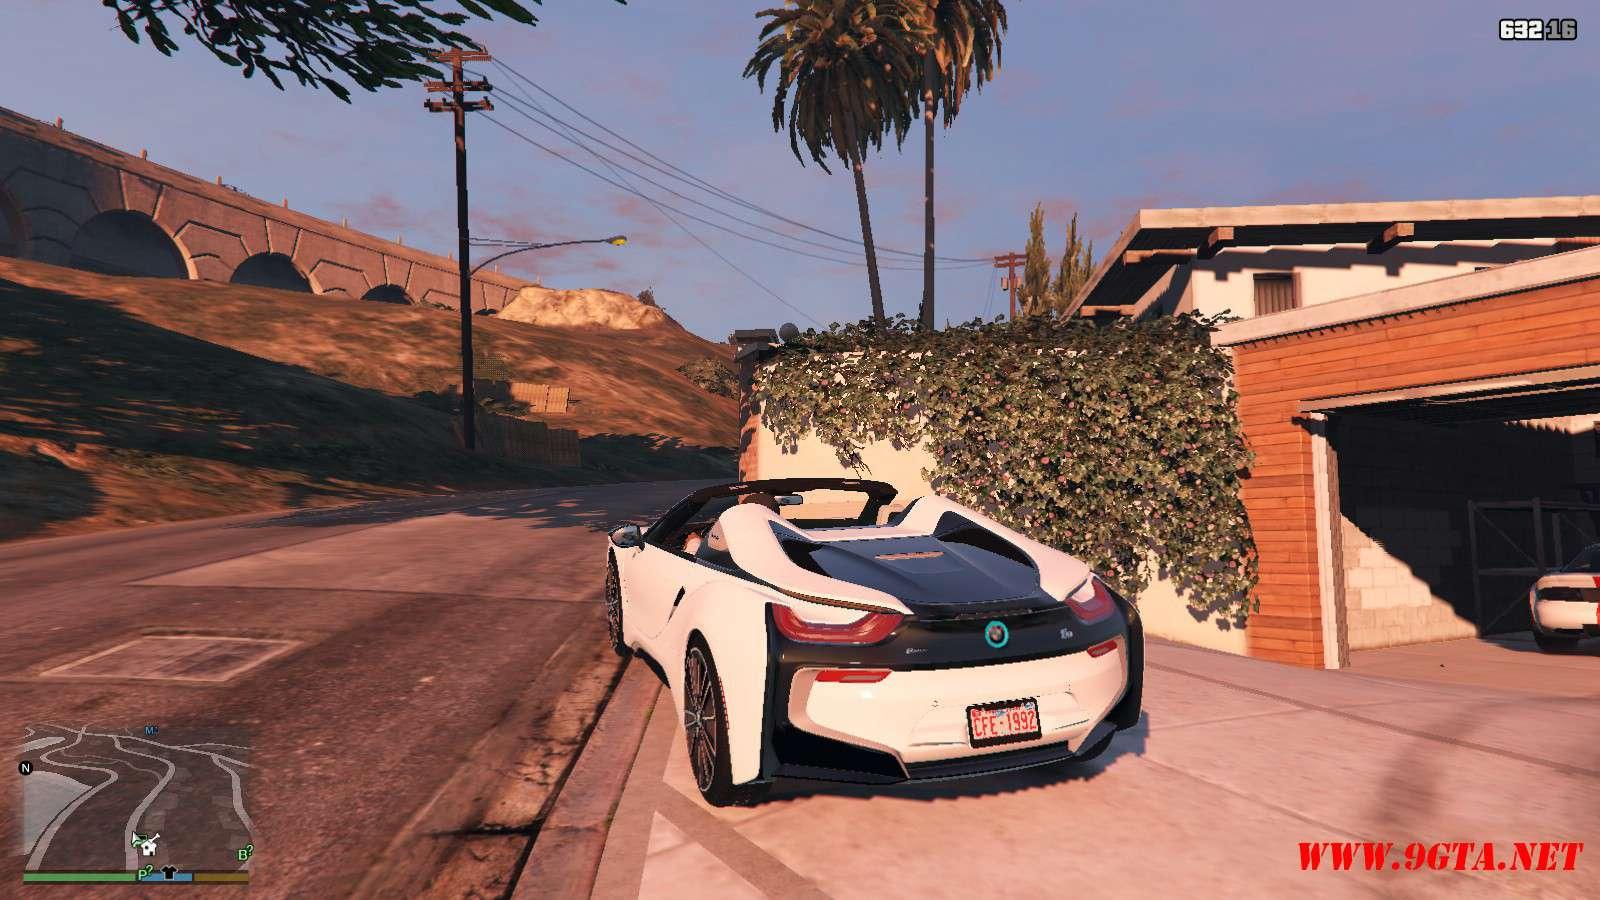 2019 BMW I8 Roadster GTA5 Mods (3)